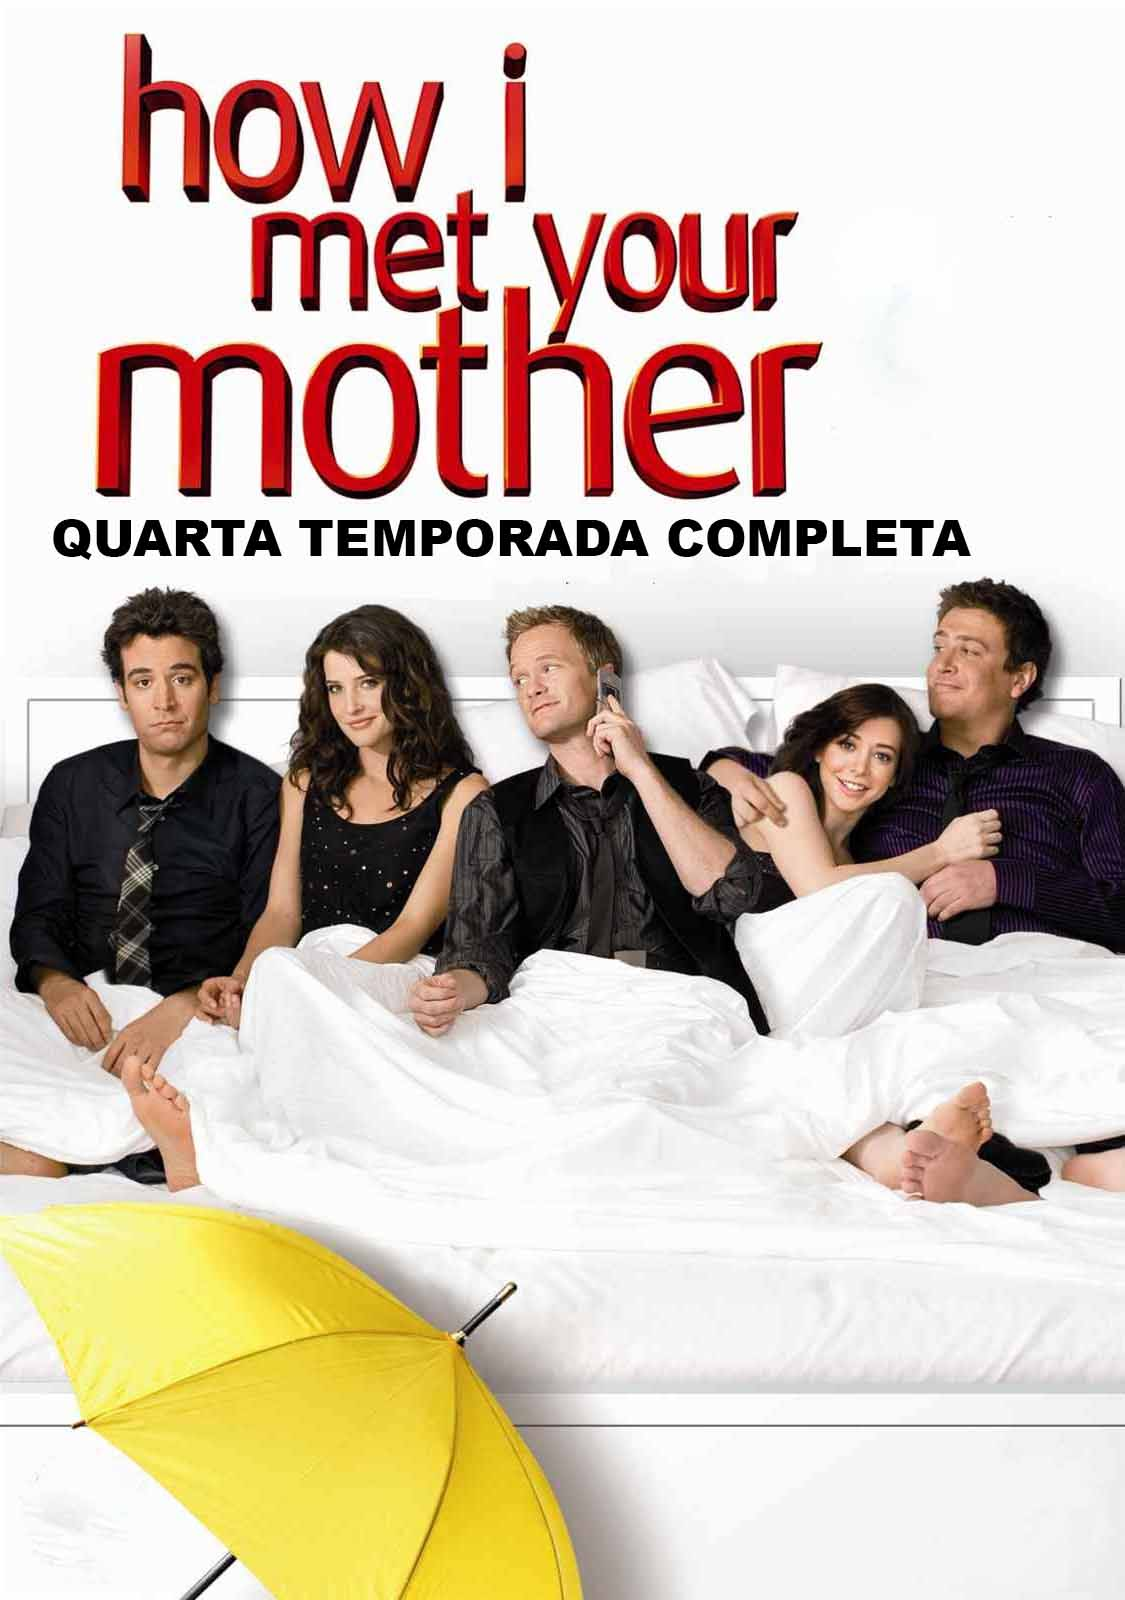 How I Met Your Mother 4ª Temporada Torrent - WEB-DL 720p Dual Áudio